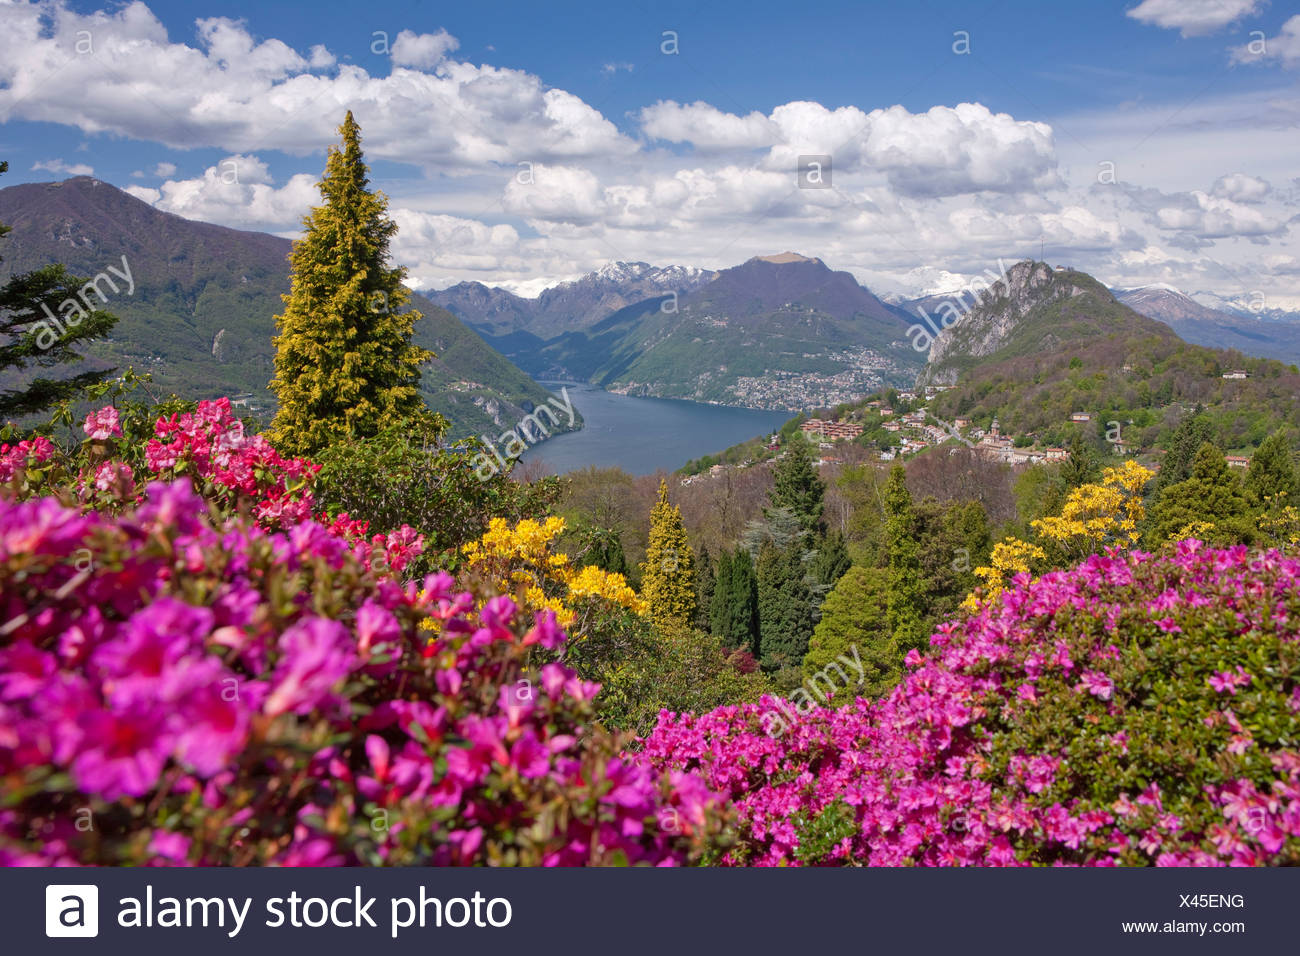 Blüte, Rhododendron, Parco San Grato, Carona, Kanton, TI, Ticino, Südschweiz, Blume, Blumen, park, Schweiz, Europ Stockfoto